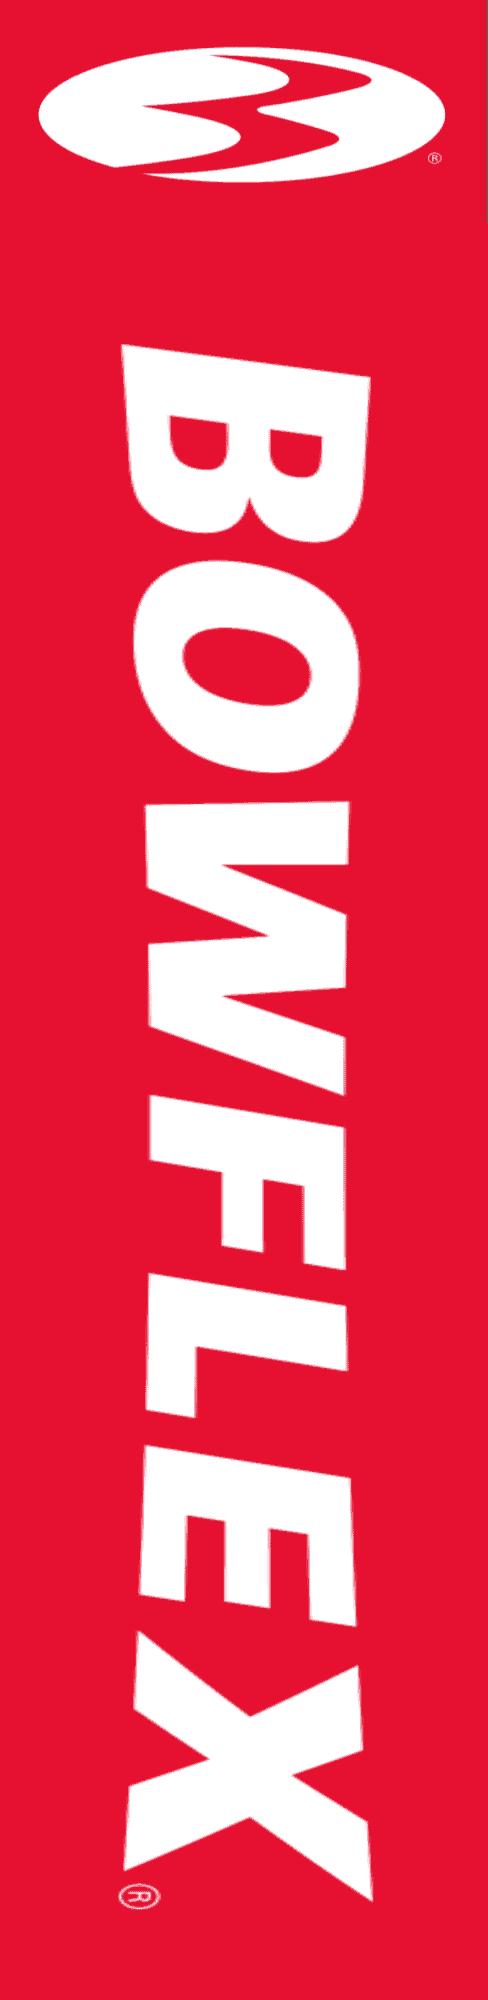 Bowflex logo side banner